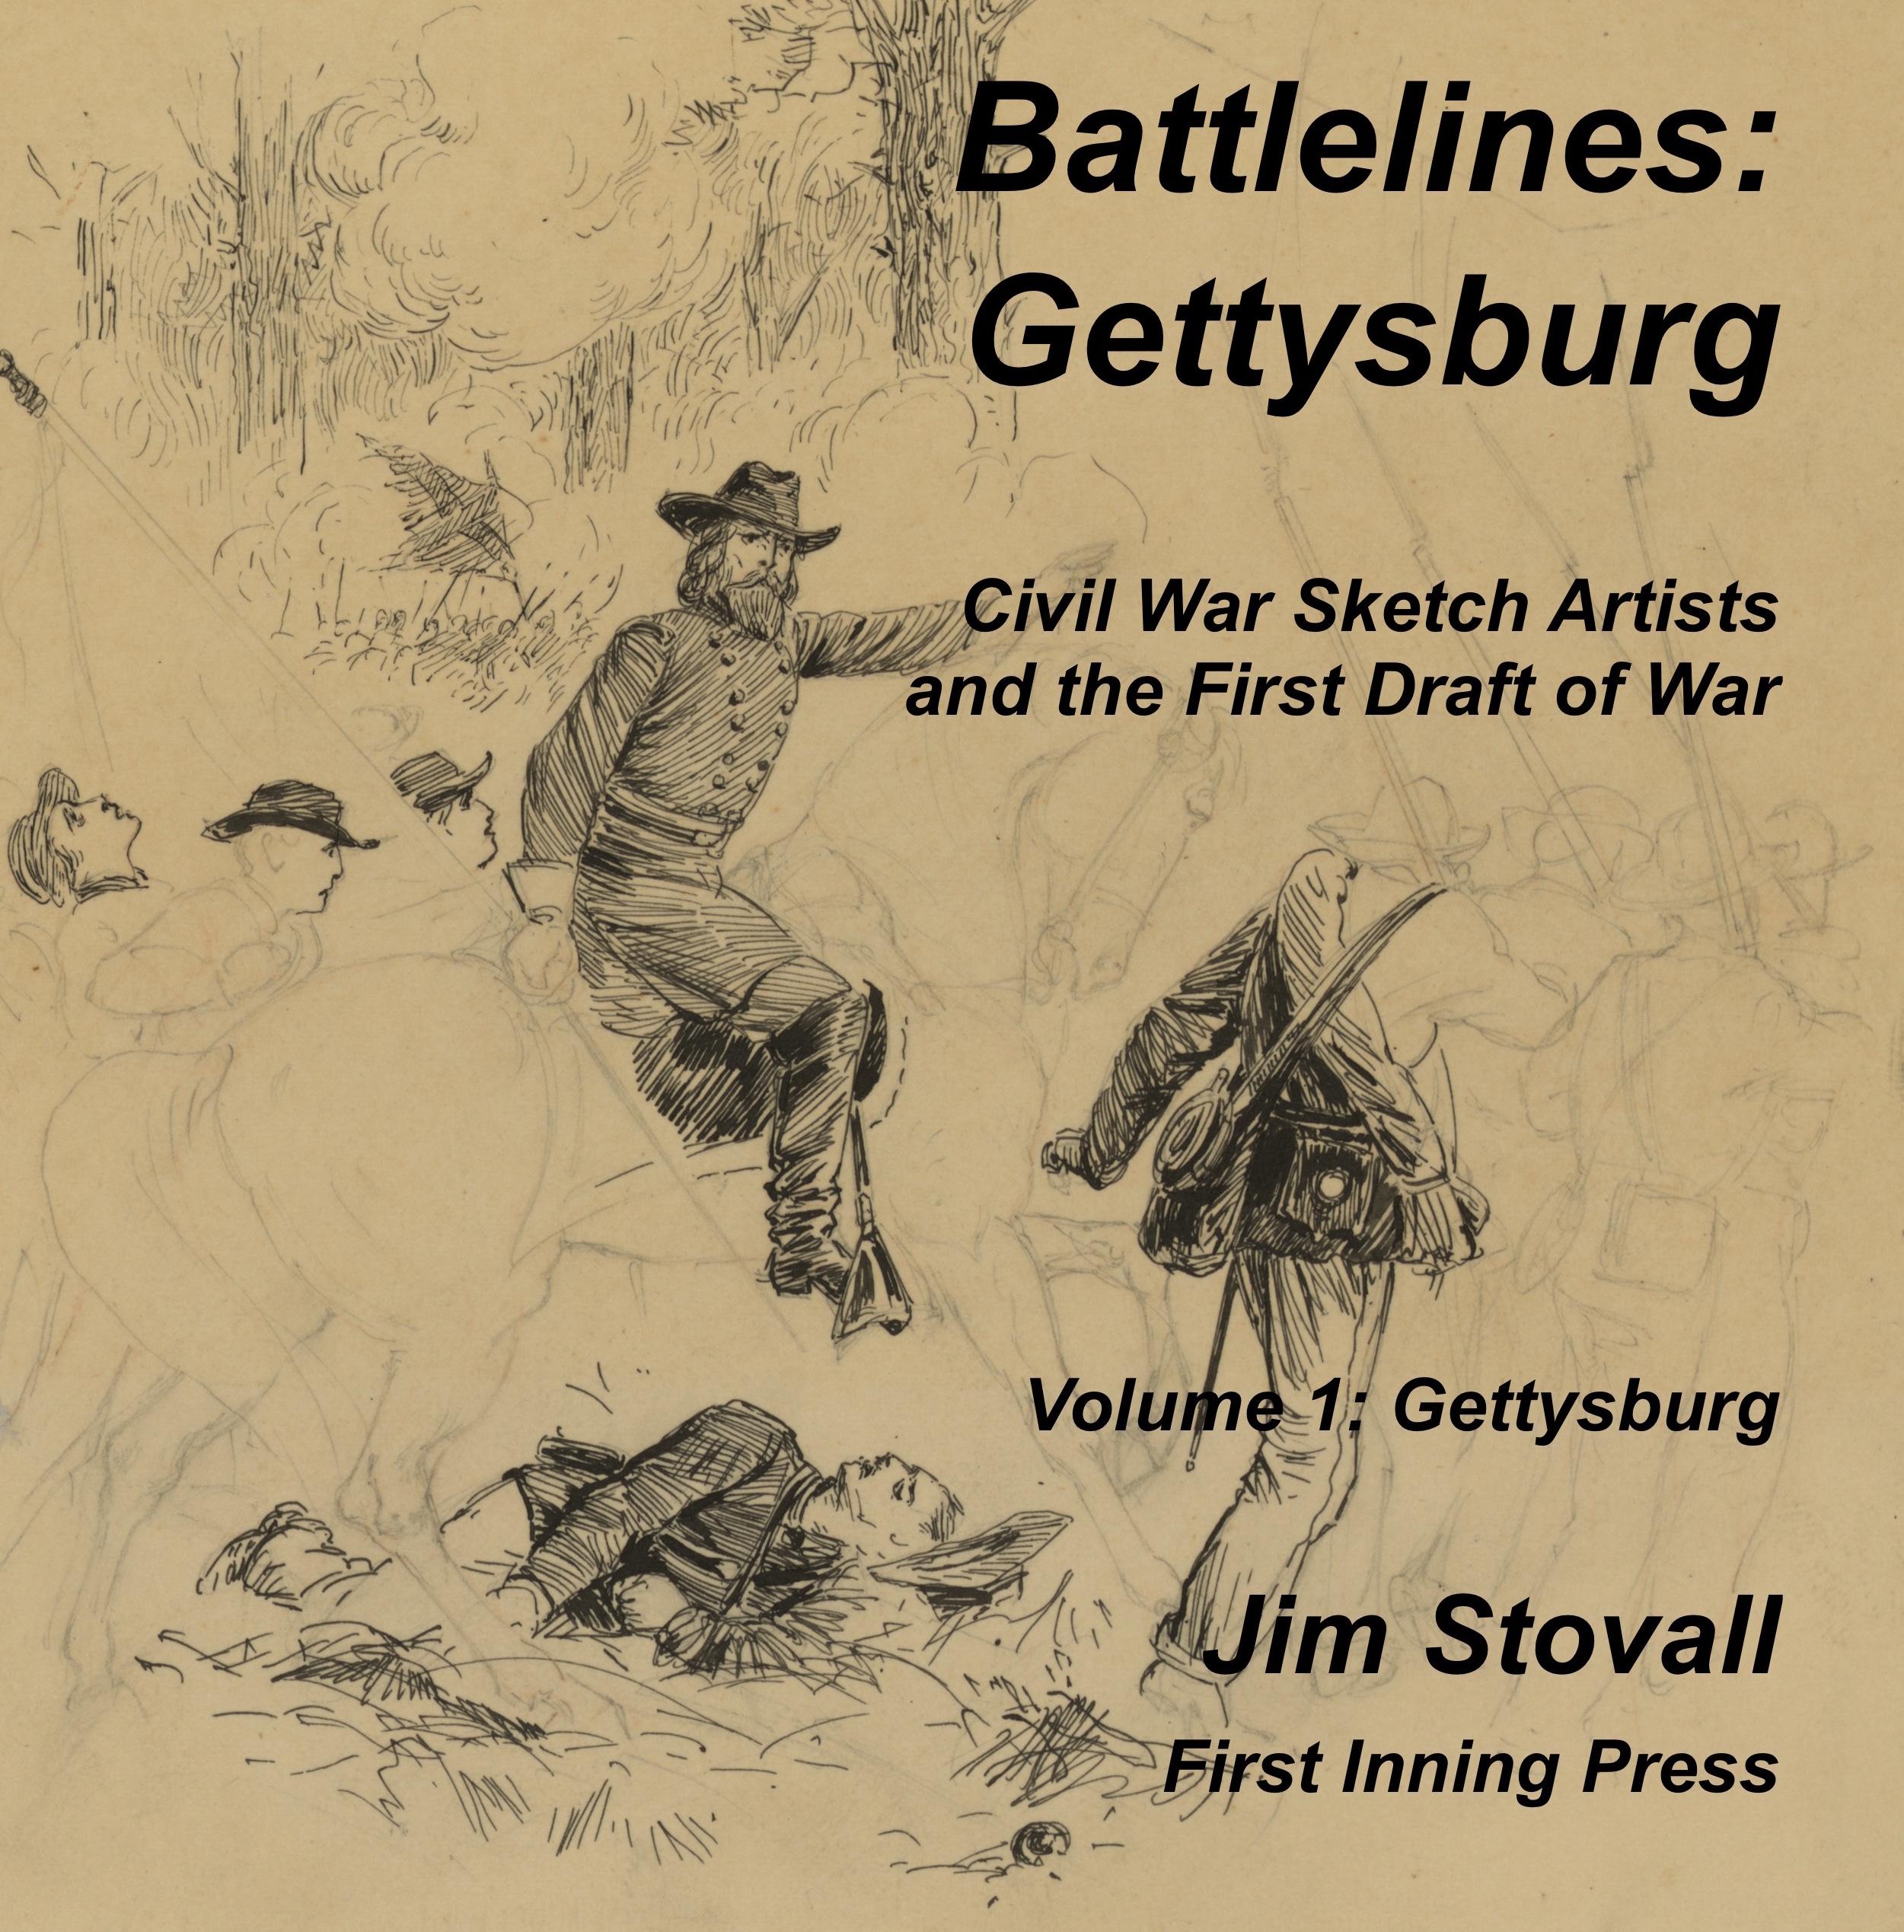 Front cover of Battlelines: Gettysburg